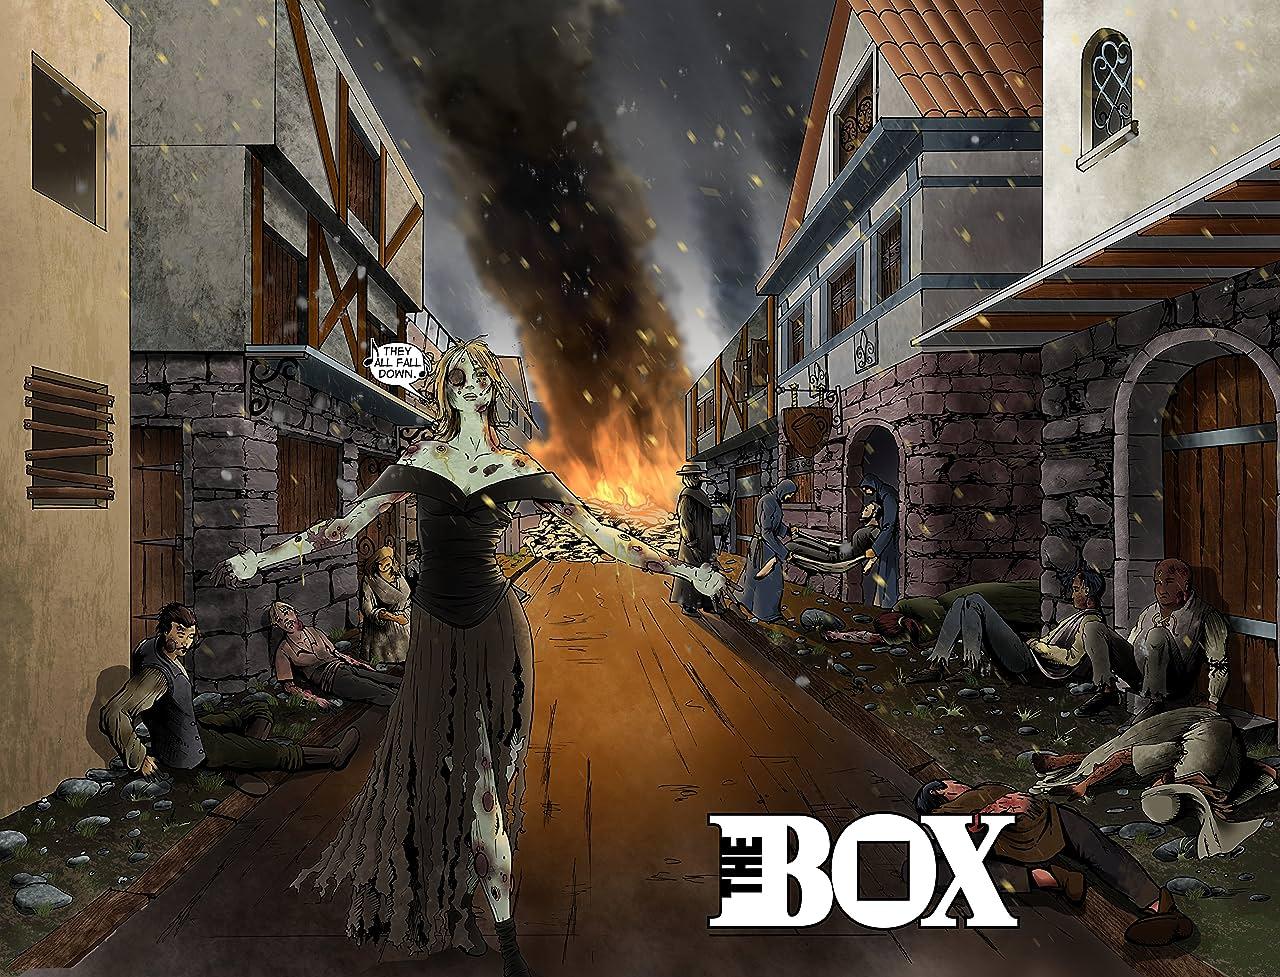 The Box #2